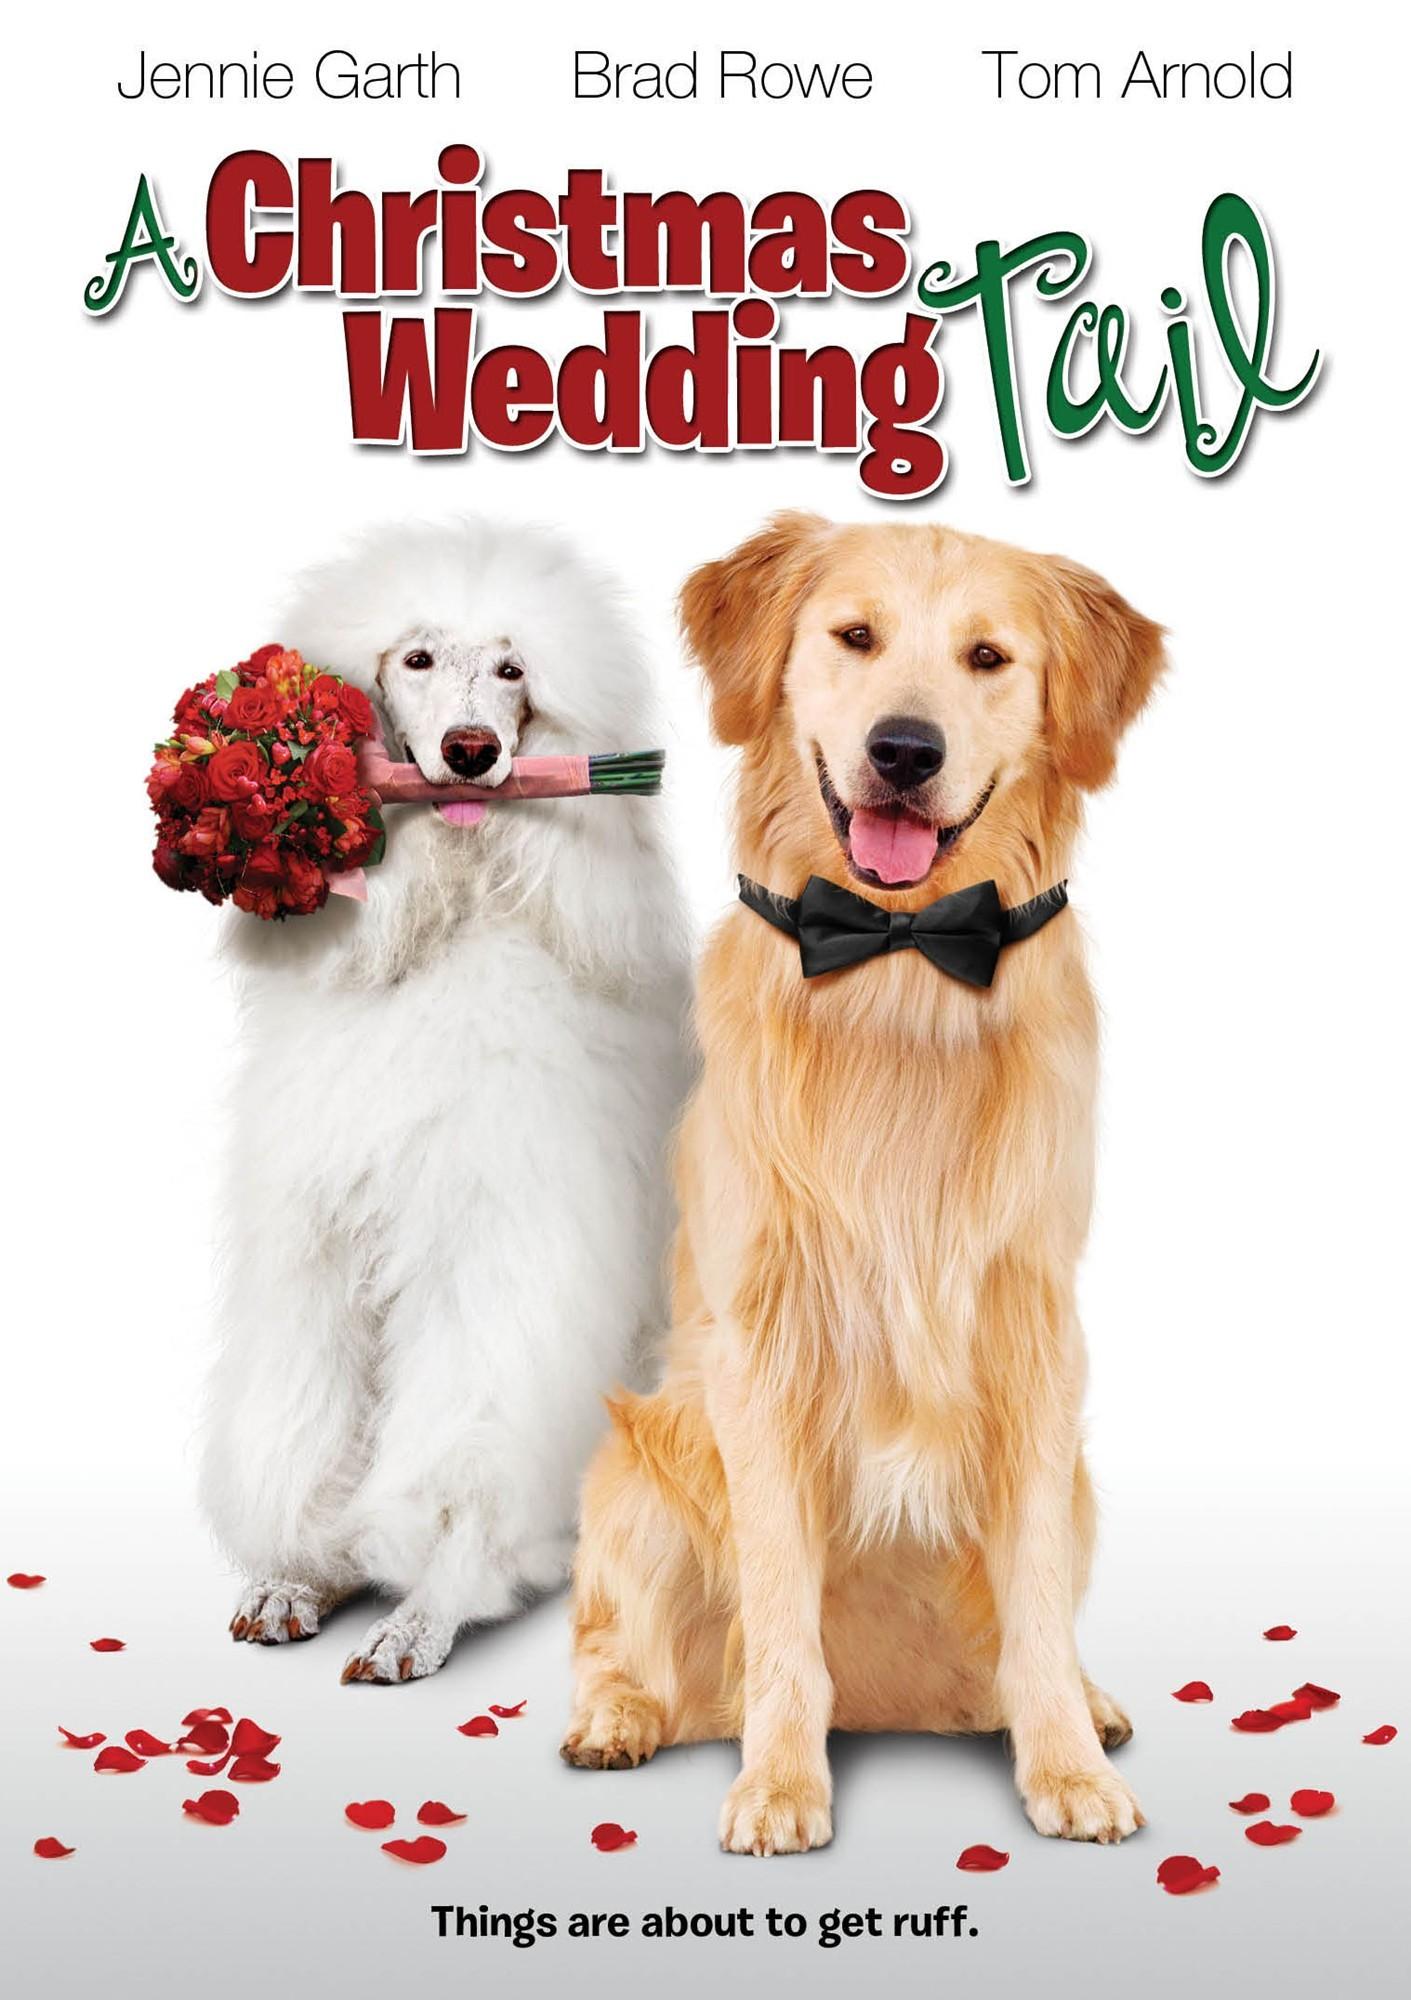 A Christmas Wedding Tail Legendado